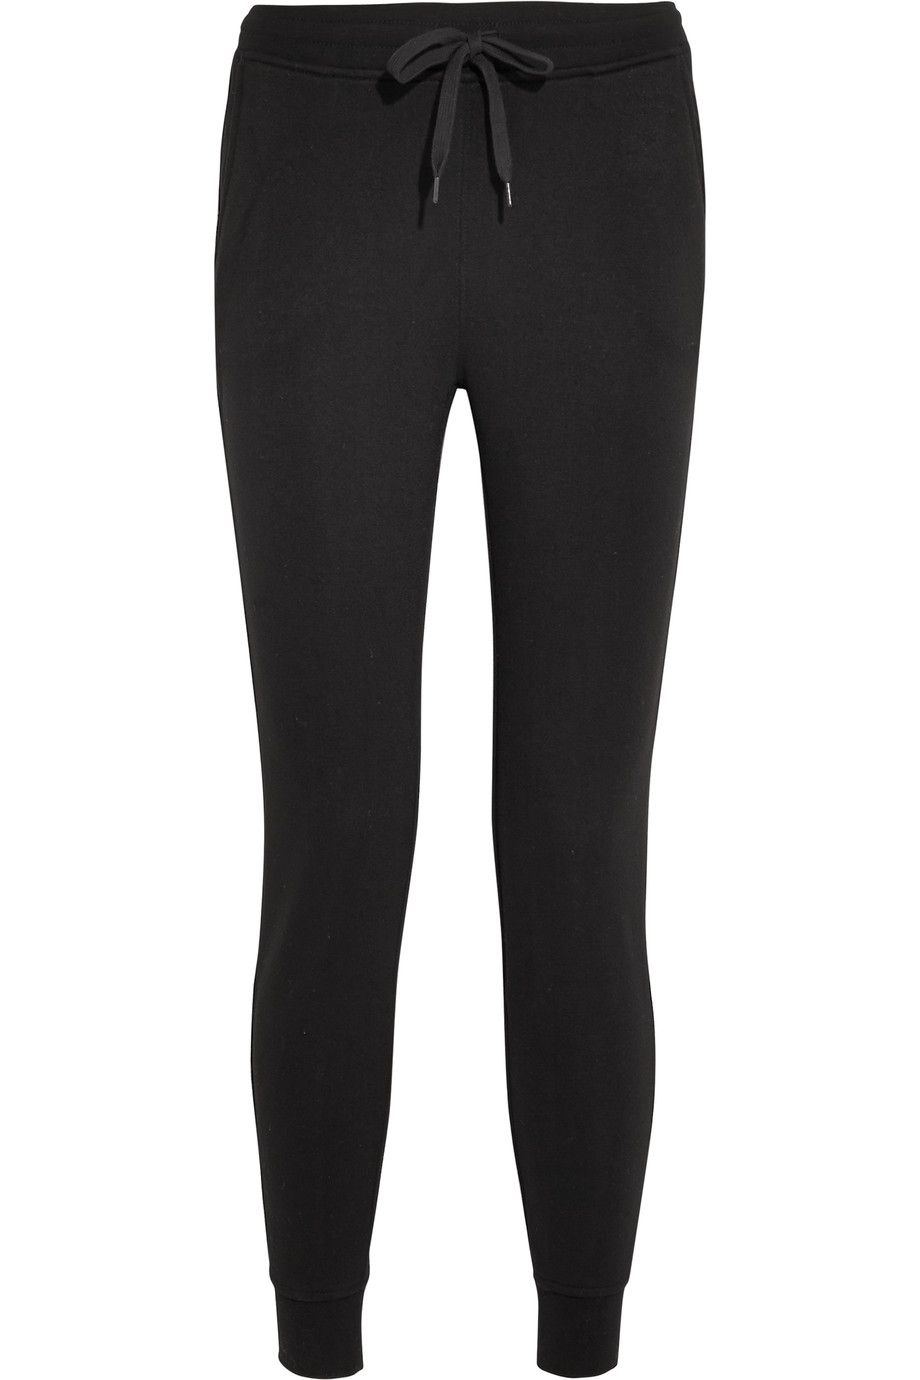 T BY ALEXANDER WANG Jersey Track Pants. #tbyalexanderwang #cloth #pants